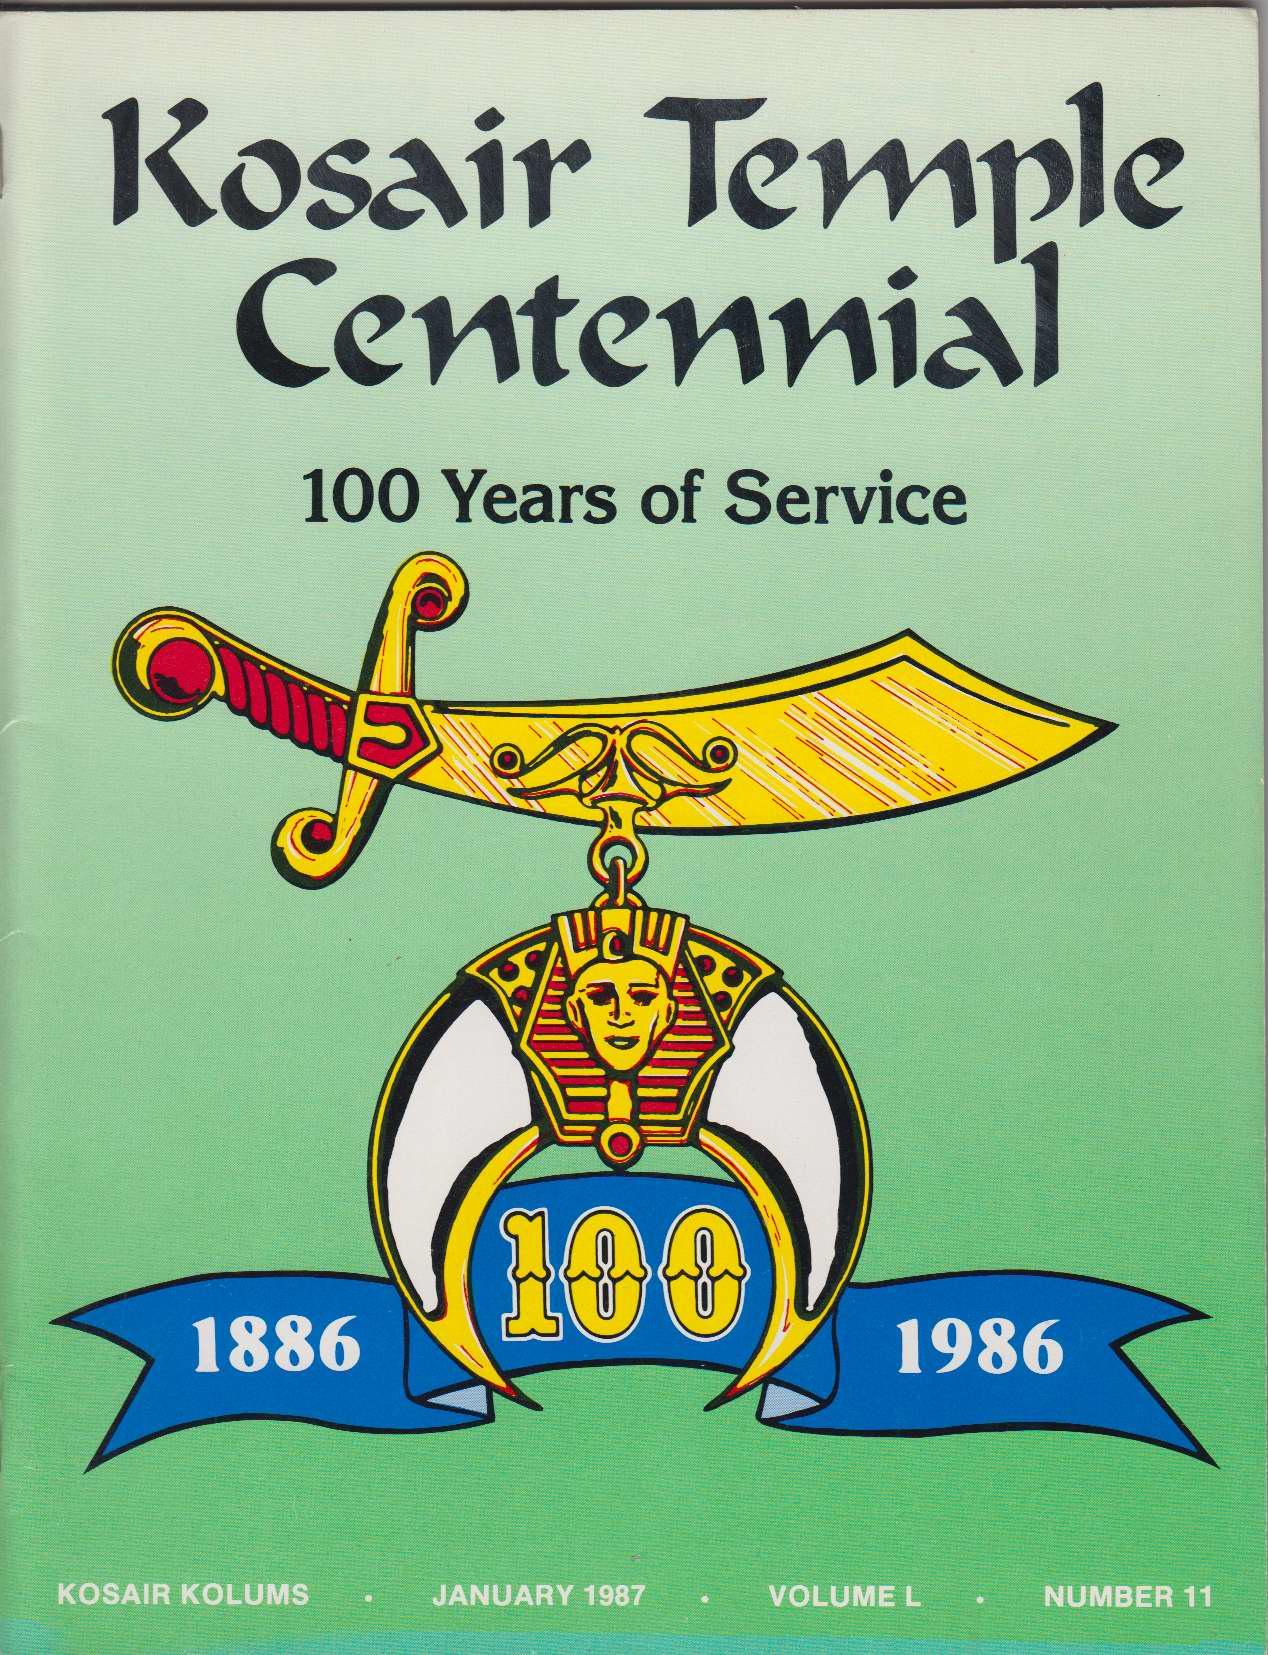 Image for Kosair Temple Centennial 100 Years of Service (Kosair Kolums (January 1987) Vol. L No. 11, Volume L, Number 11)